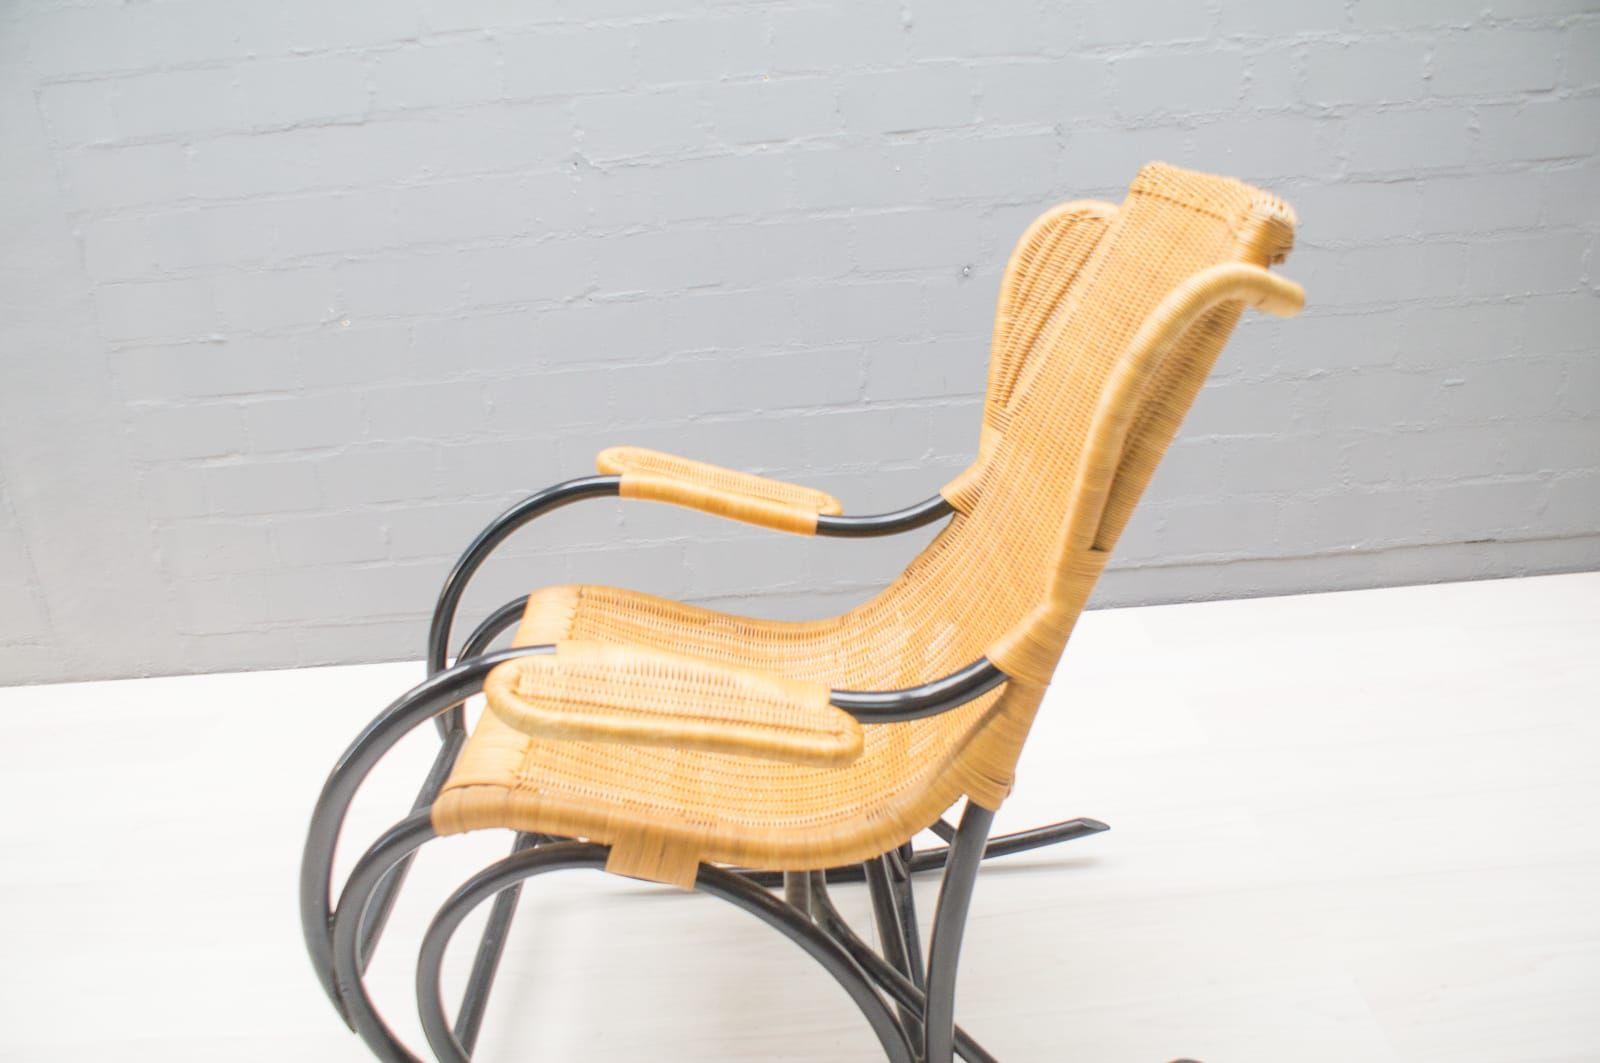 Vintage rattan rocking chair - Vintage Rattan Rocking Chair 1970s